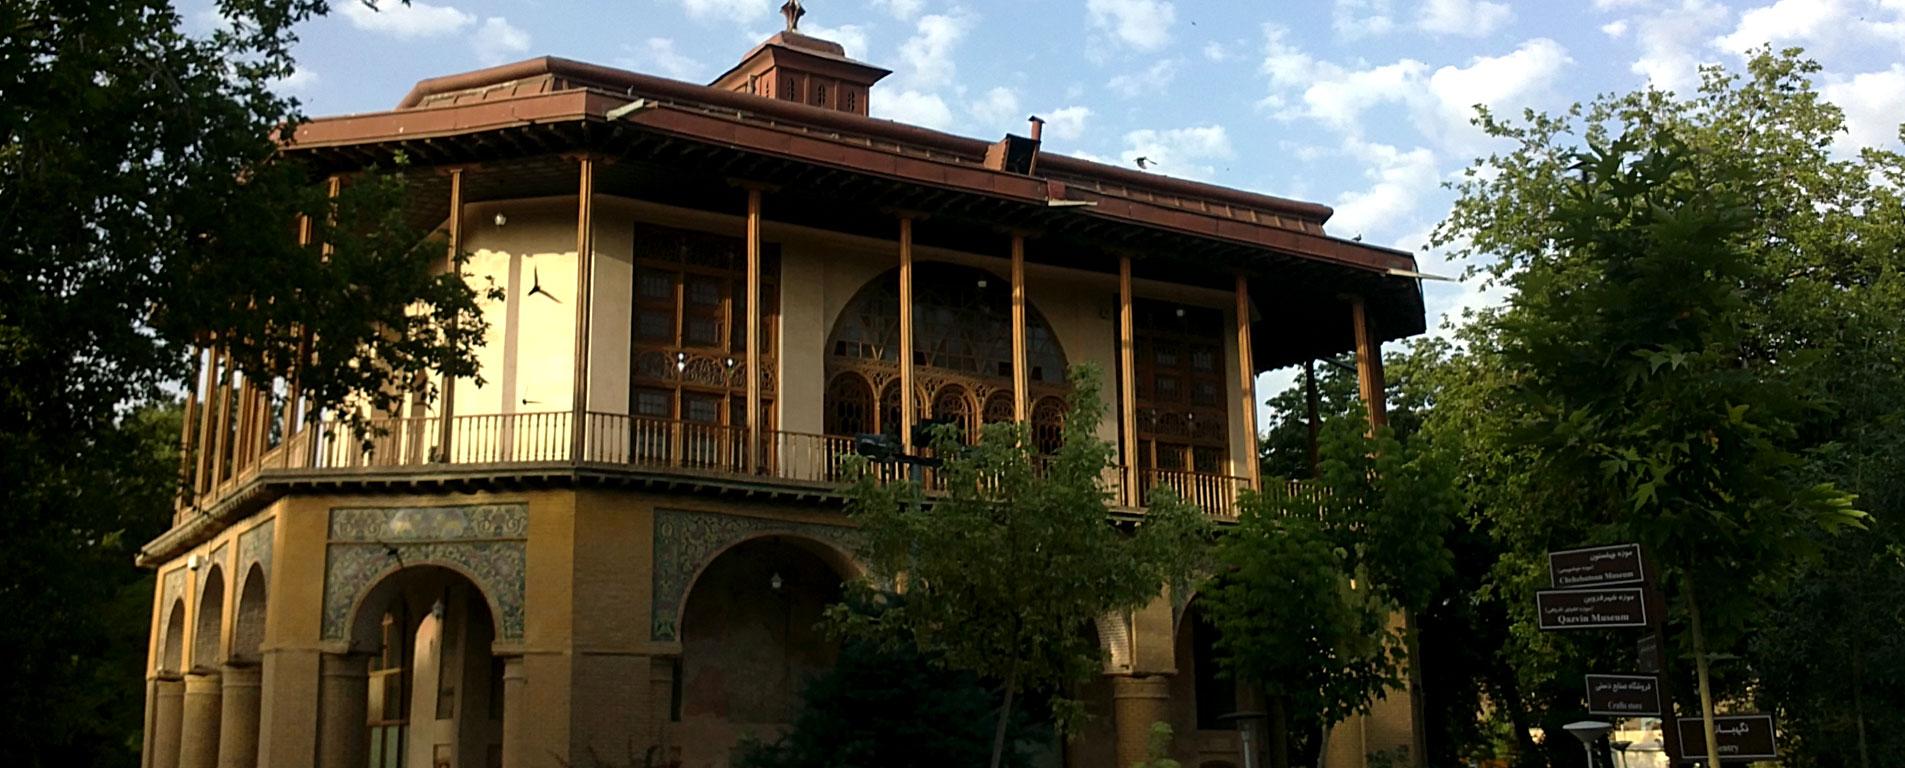 باغ صفوی قزوین ، یادگار عصر صفویها